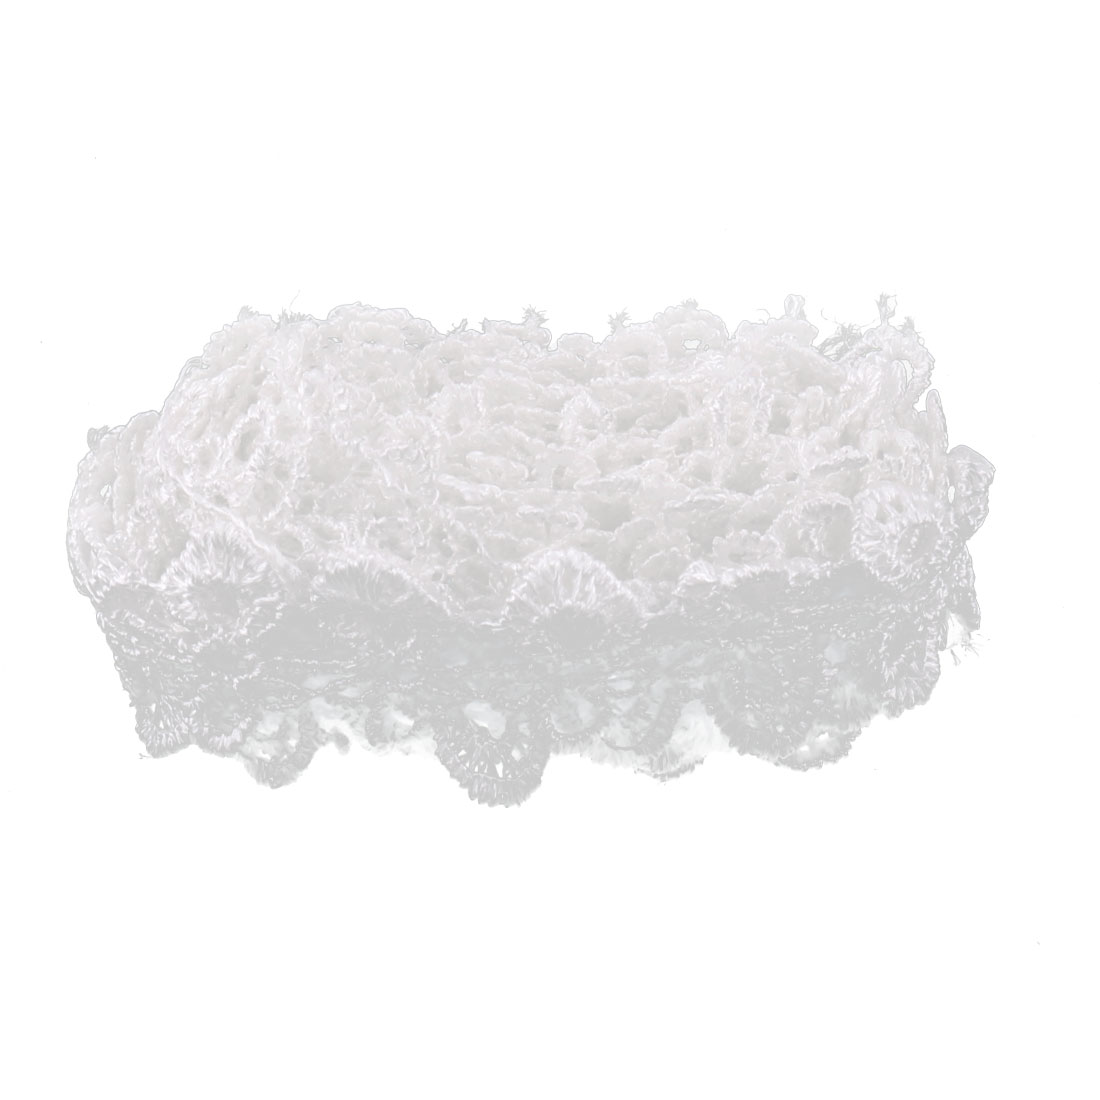 Bride Polyester Skirt Dress Headband Handcraft Sewing DIY Decor Lace Trim White